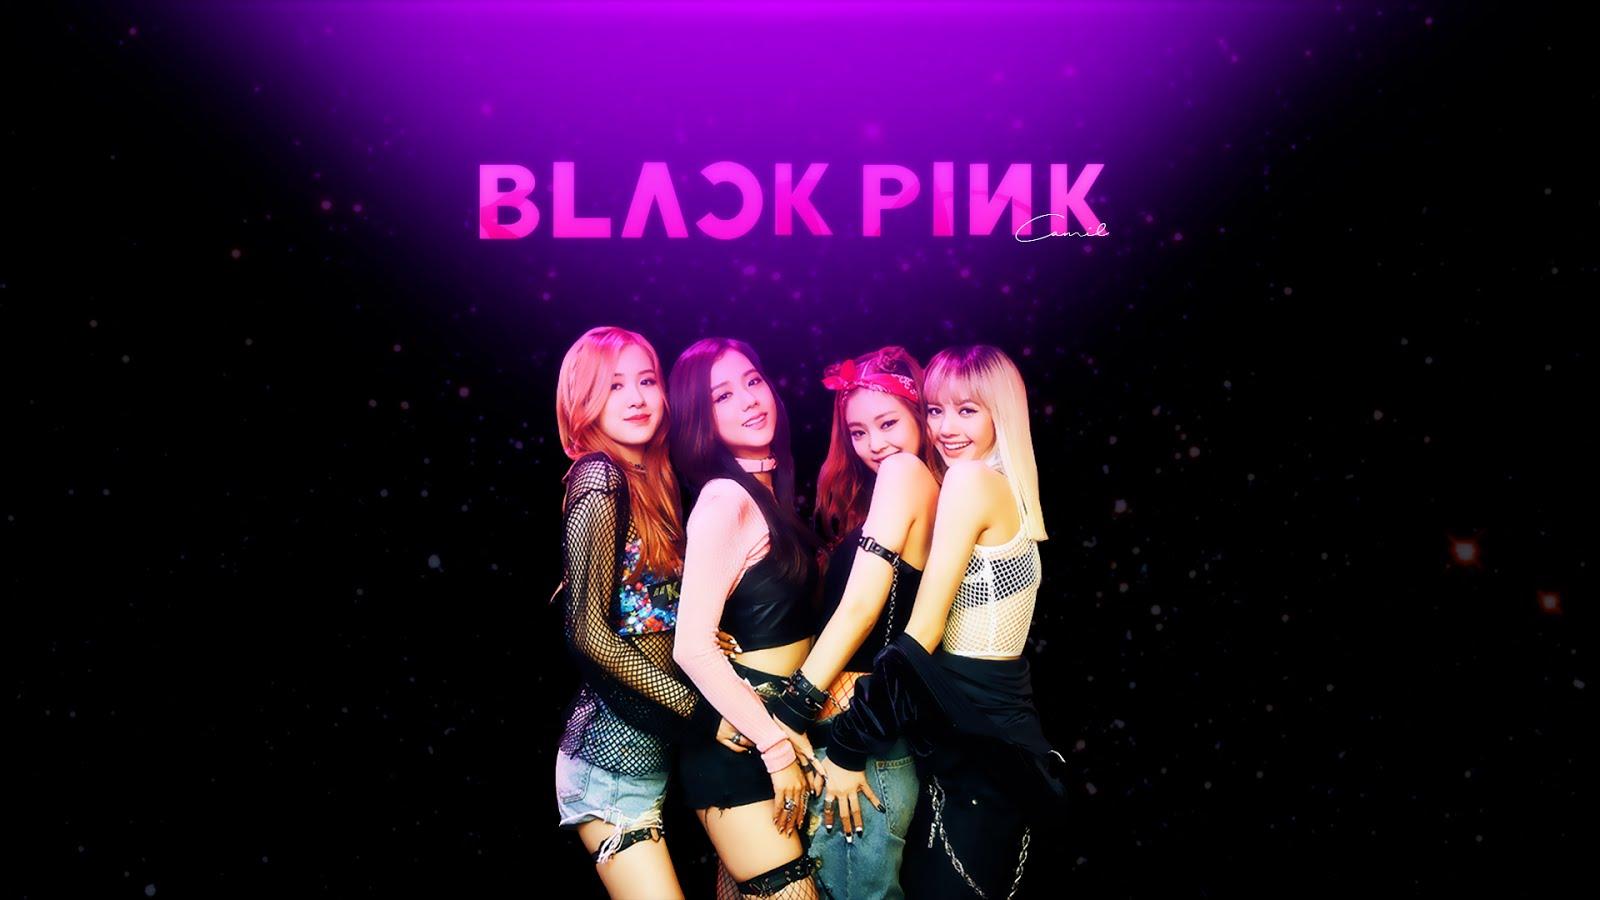 BlackPink rövid történeteim